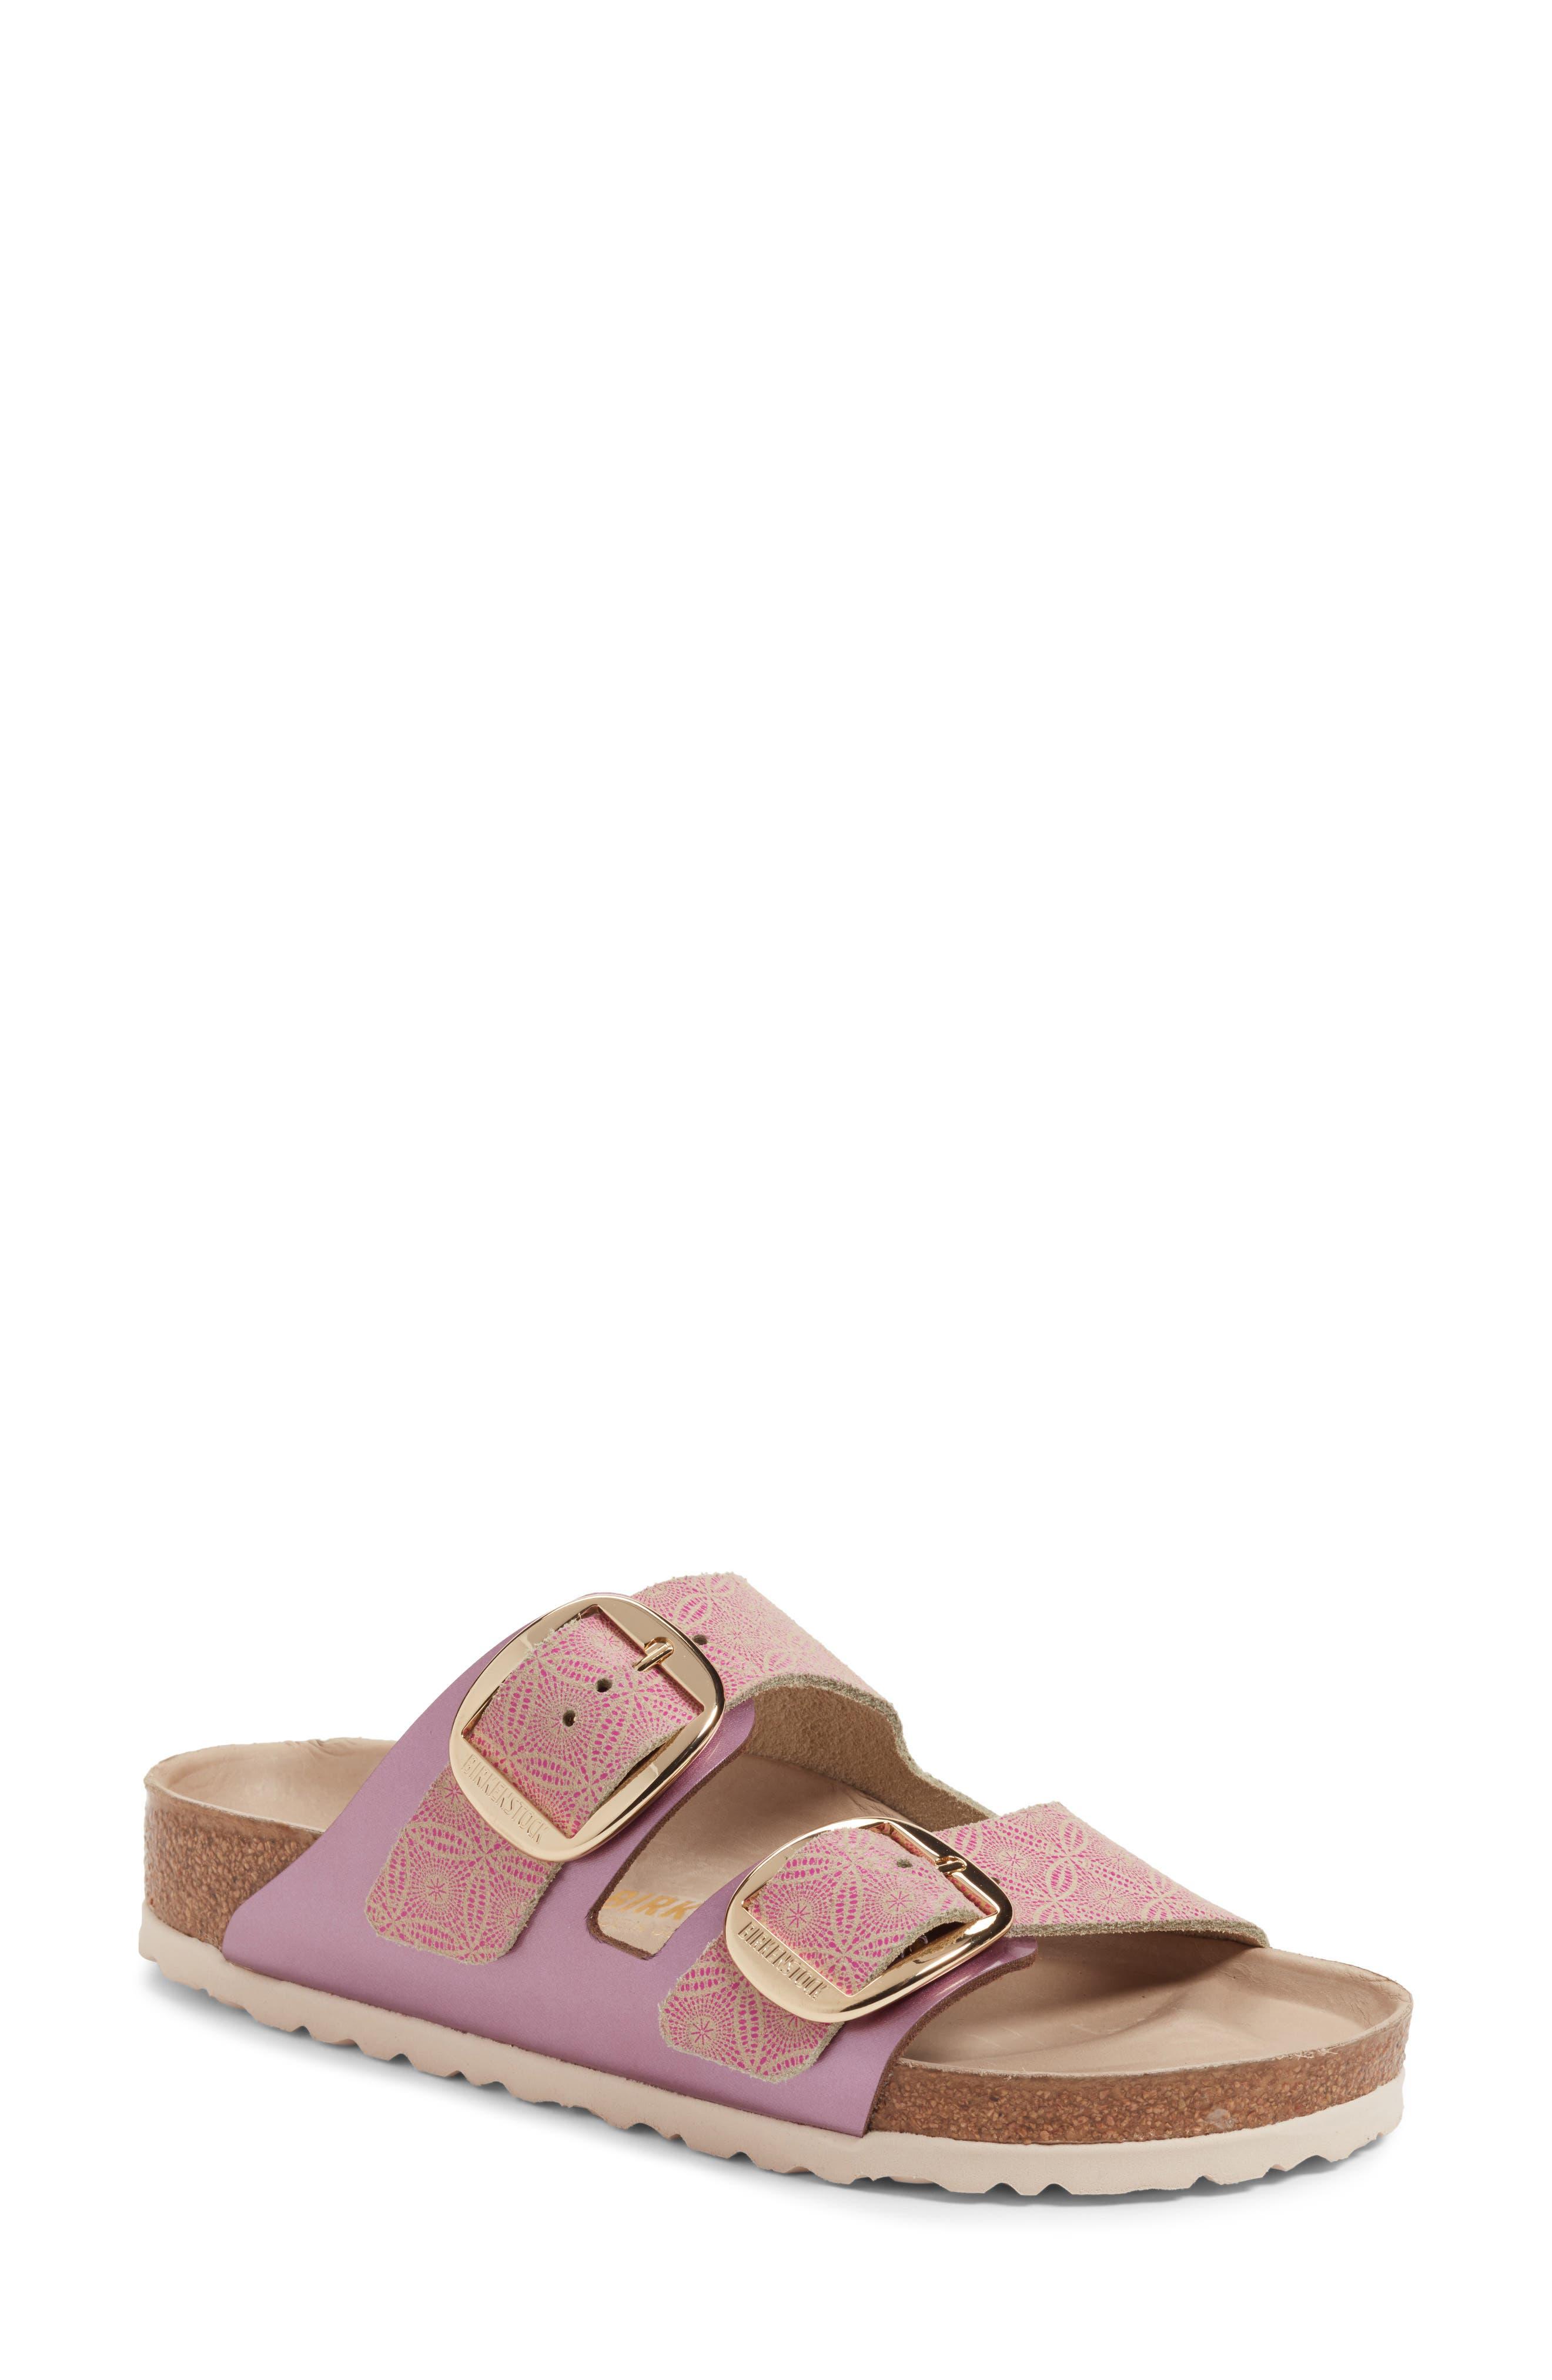 Arizona Big Buckle Slide Sandal,                         Main,                         color, Ceramic Rose Leather